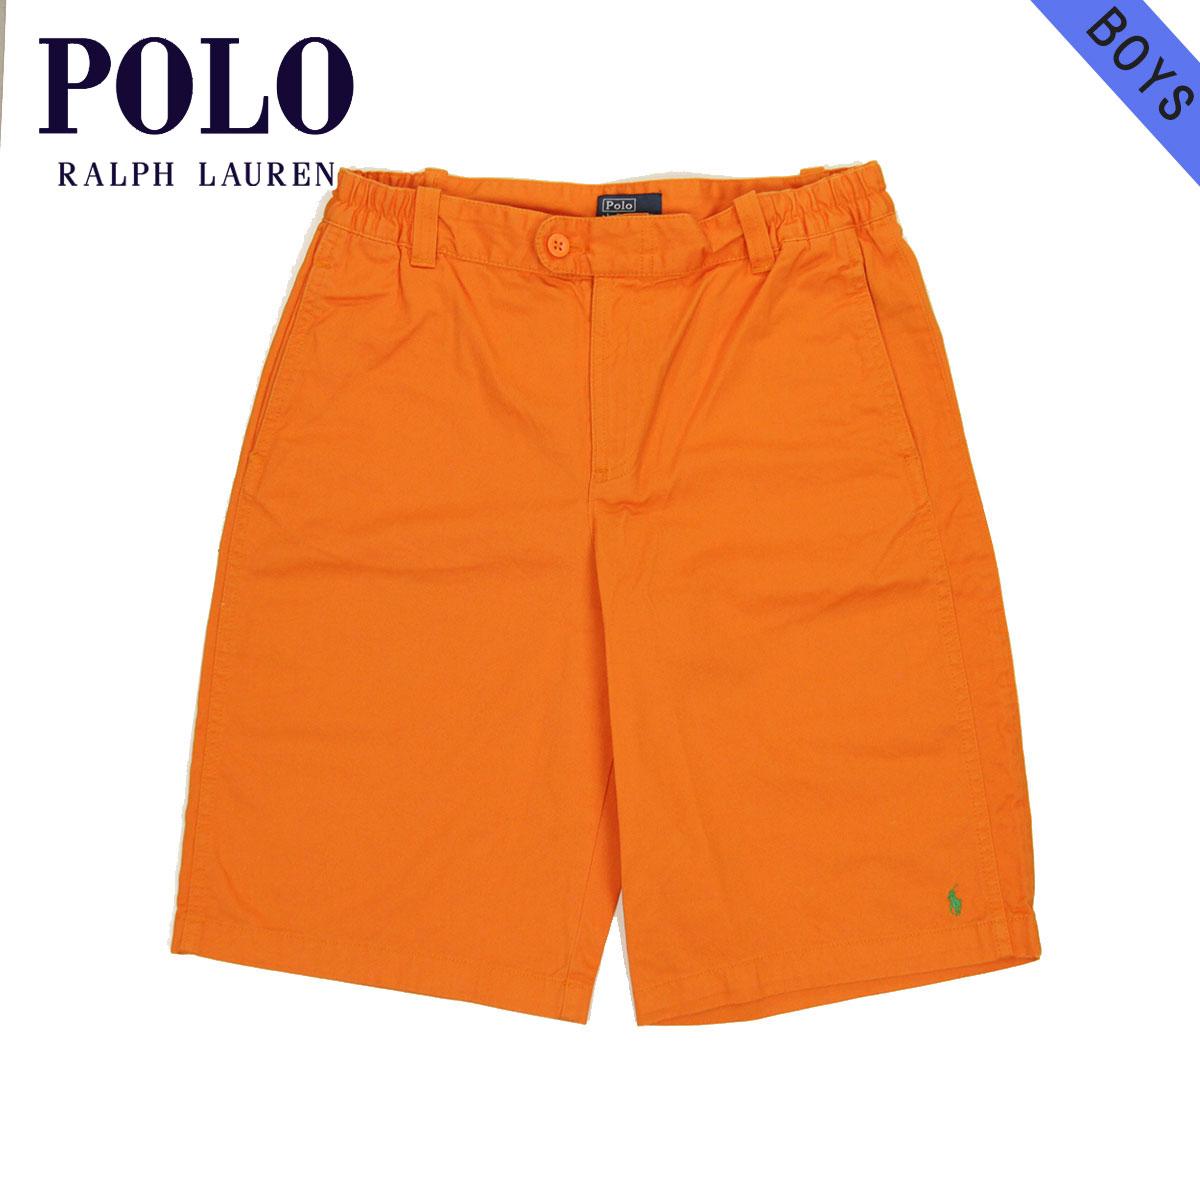 e2438c784a9 Poloralflorenkids POLO RALPH LAUREN CHILDREN genuine kids clothing boys  shorts Vintage Cotton Varsity Short  19150726 belt no ORANGE 10P10Jan15